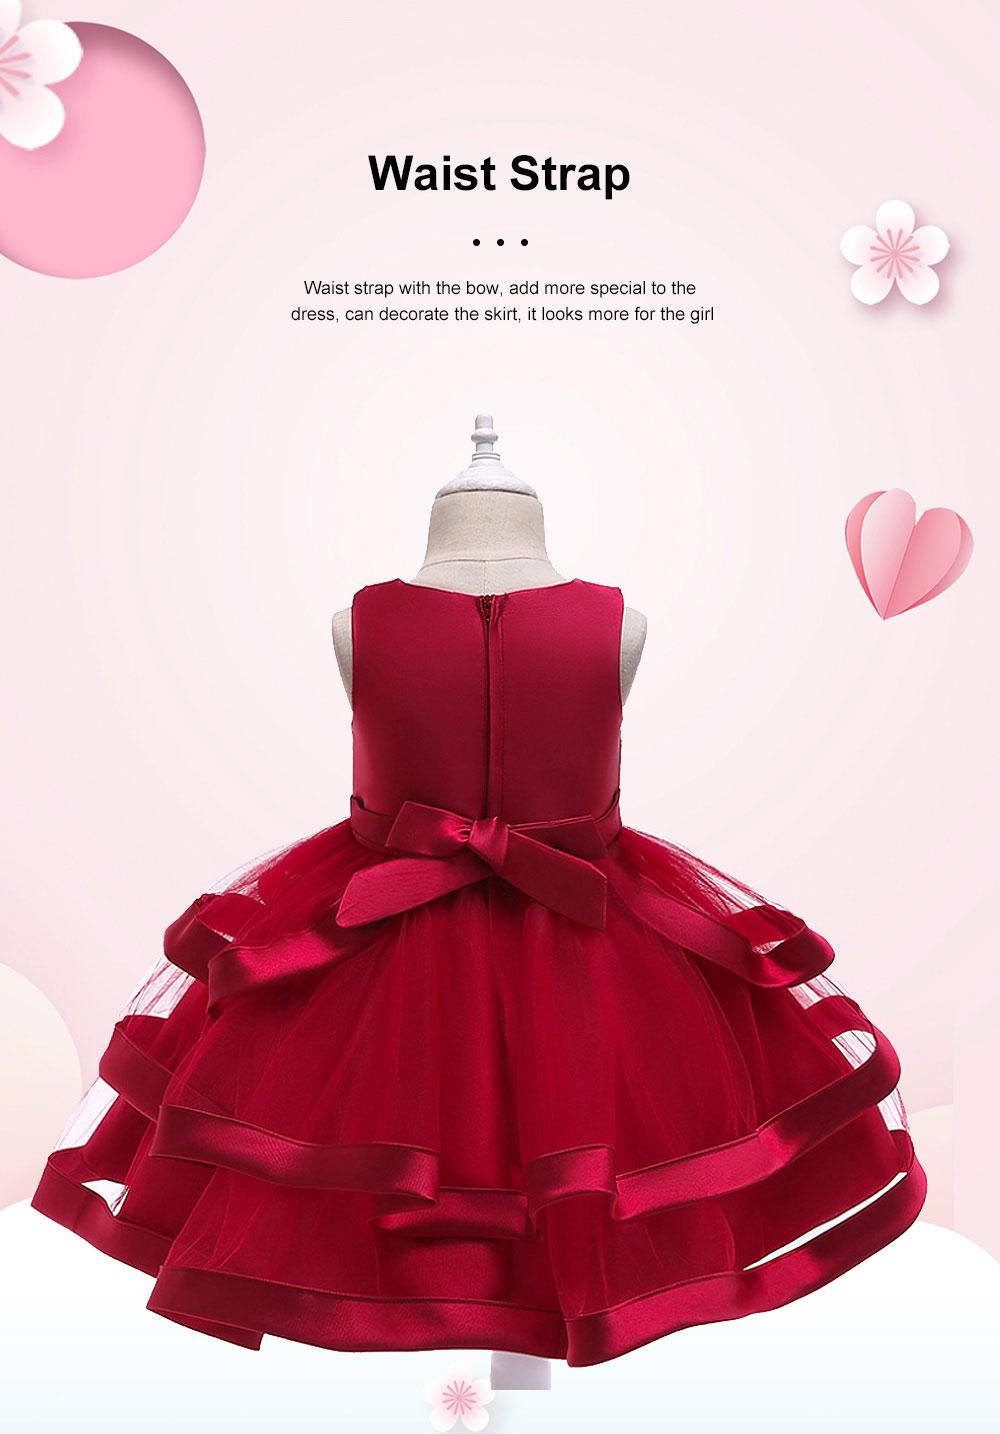 Female Flower Skirts Kids Girls Flower Wedding Dress, Multi-layer Mesh Gauze skirt, Multi-layered Show Dress Party Suit 2